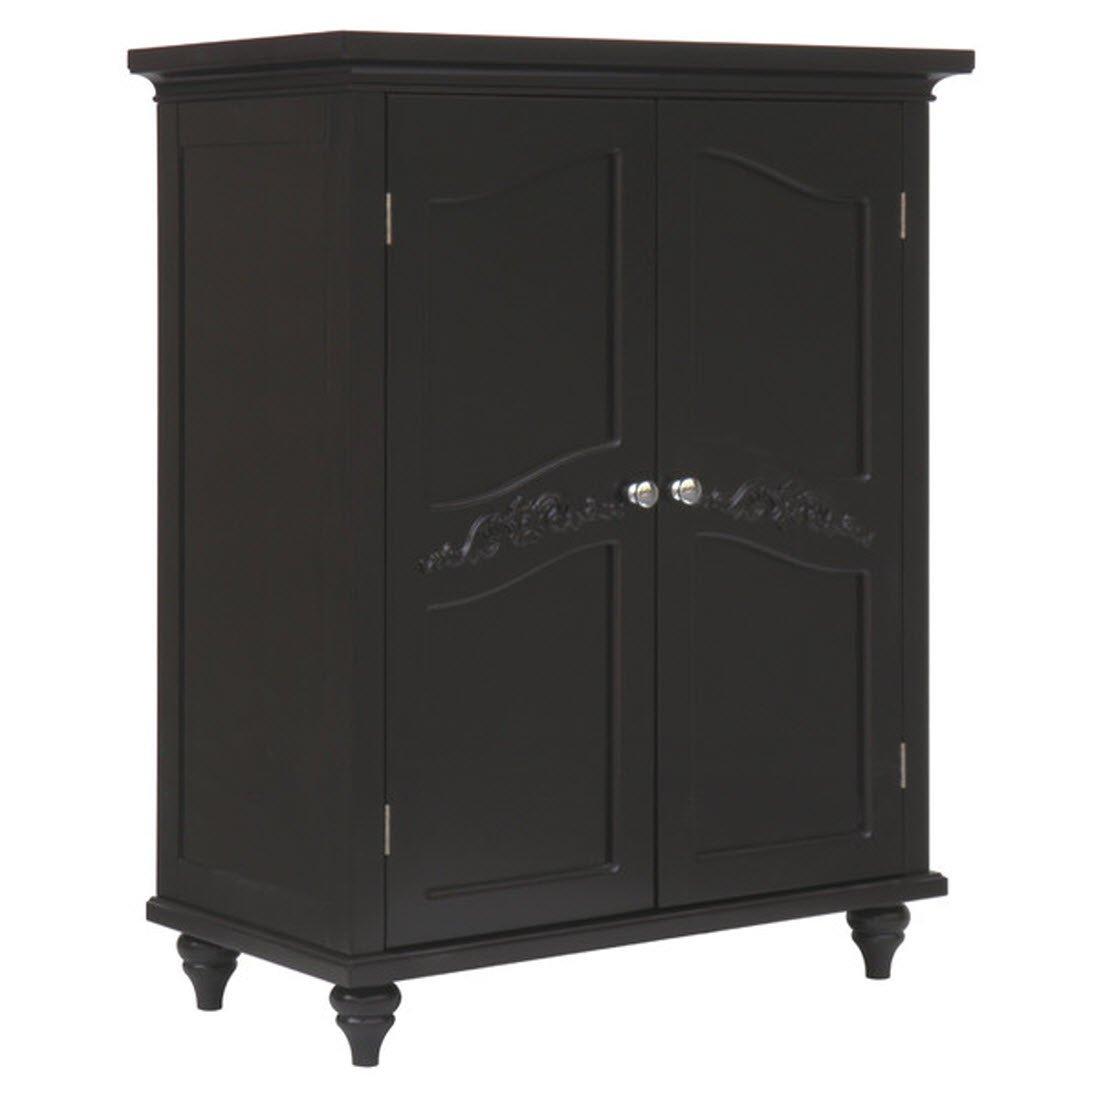 Dark Espresso 27'' x 34'' Free Standing Cabinet with Adjustable Inner Shelves